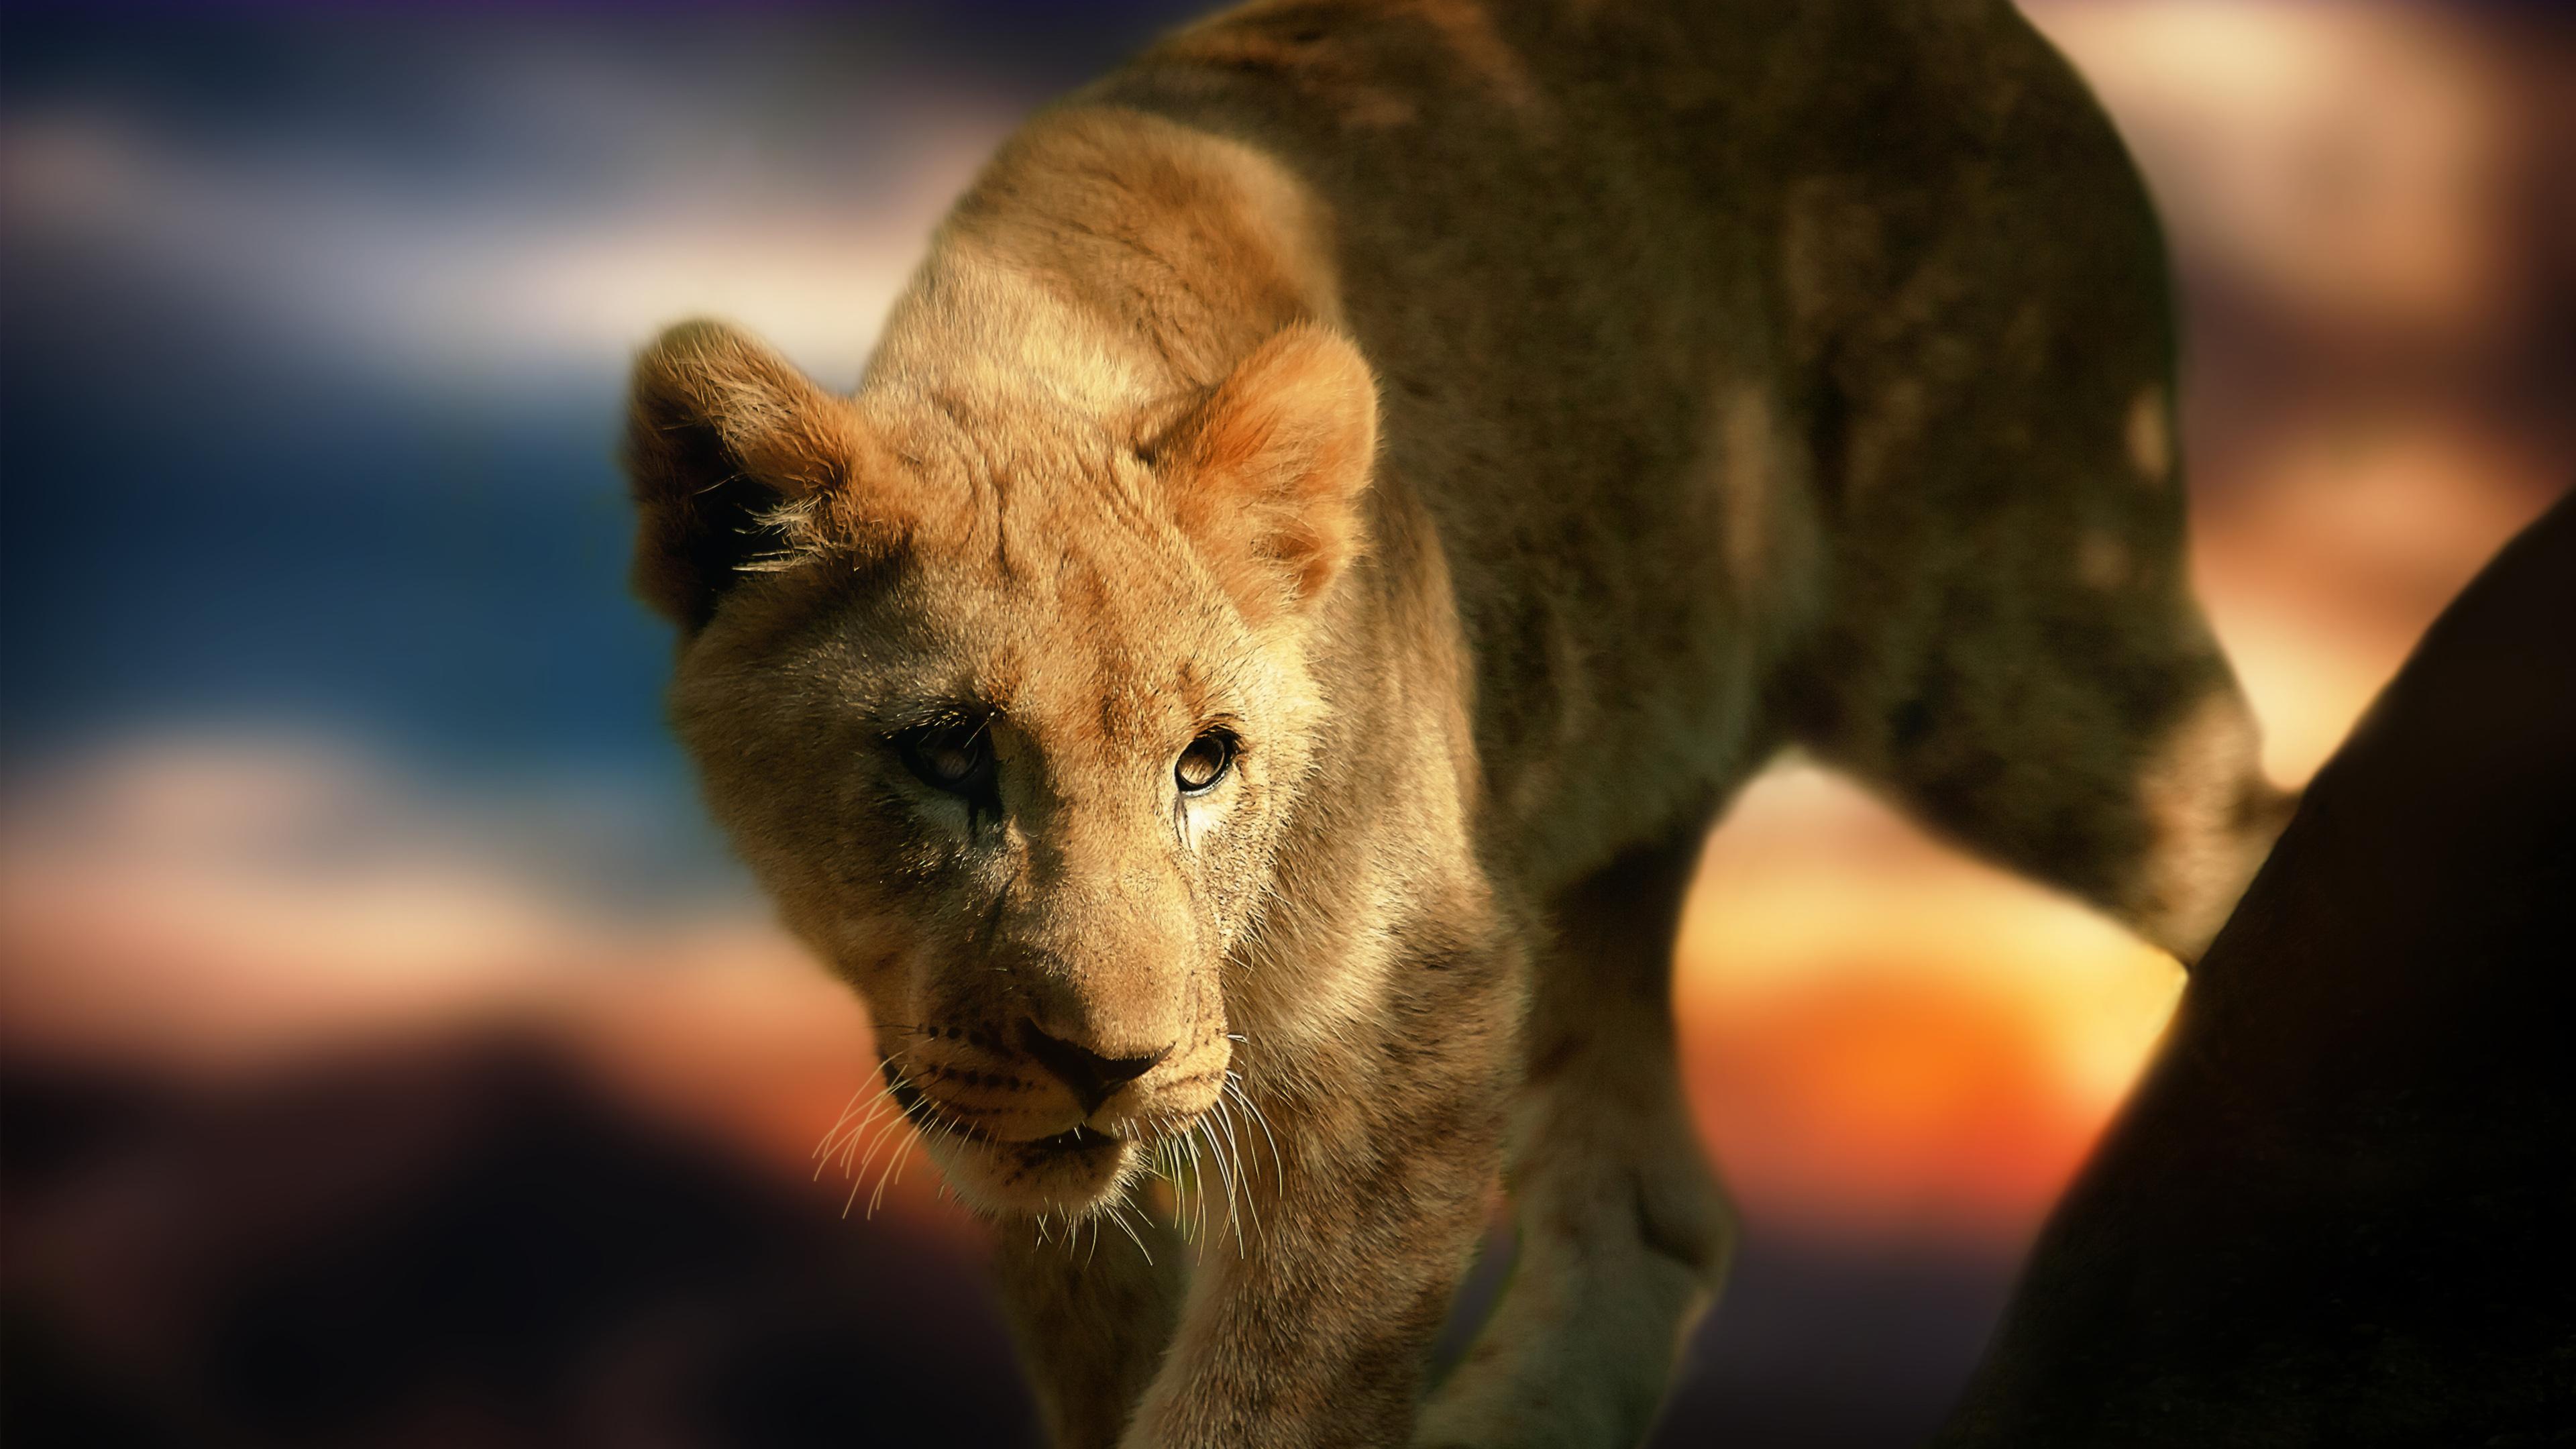 Best Wallpaper Lion Facebook - lion%252520cub  Gallery_45575.jpg